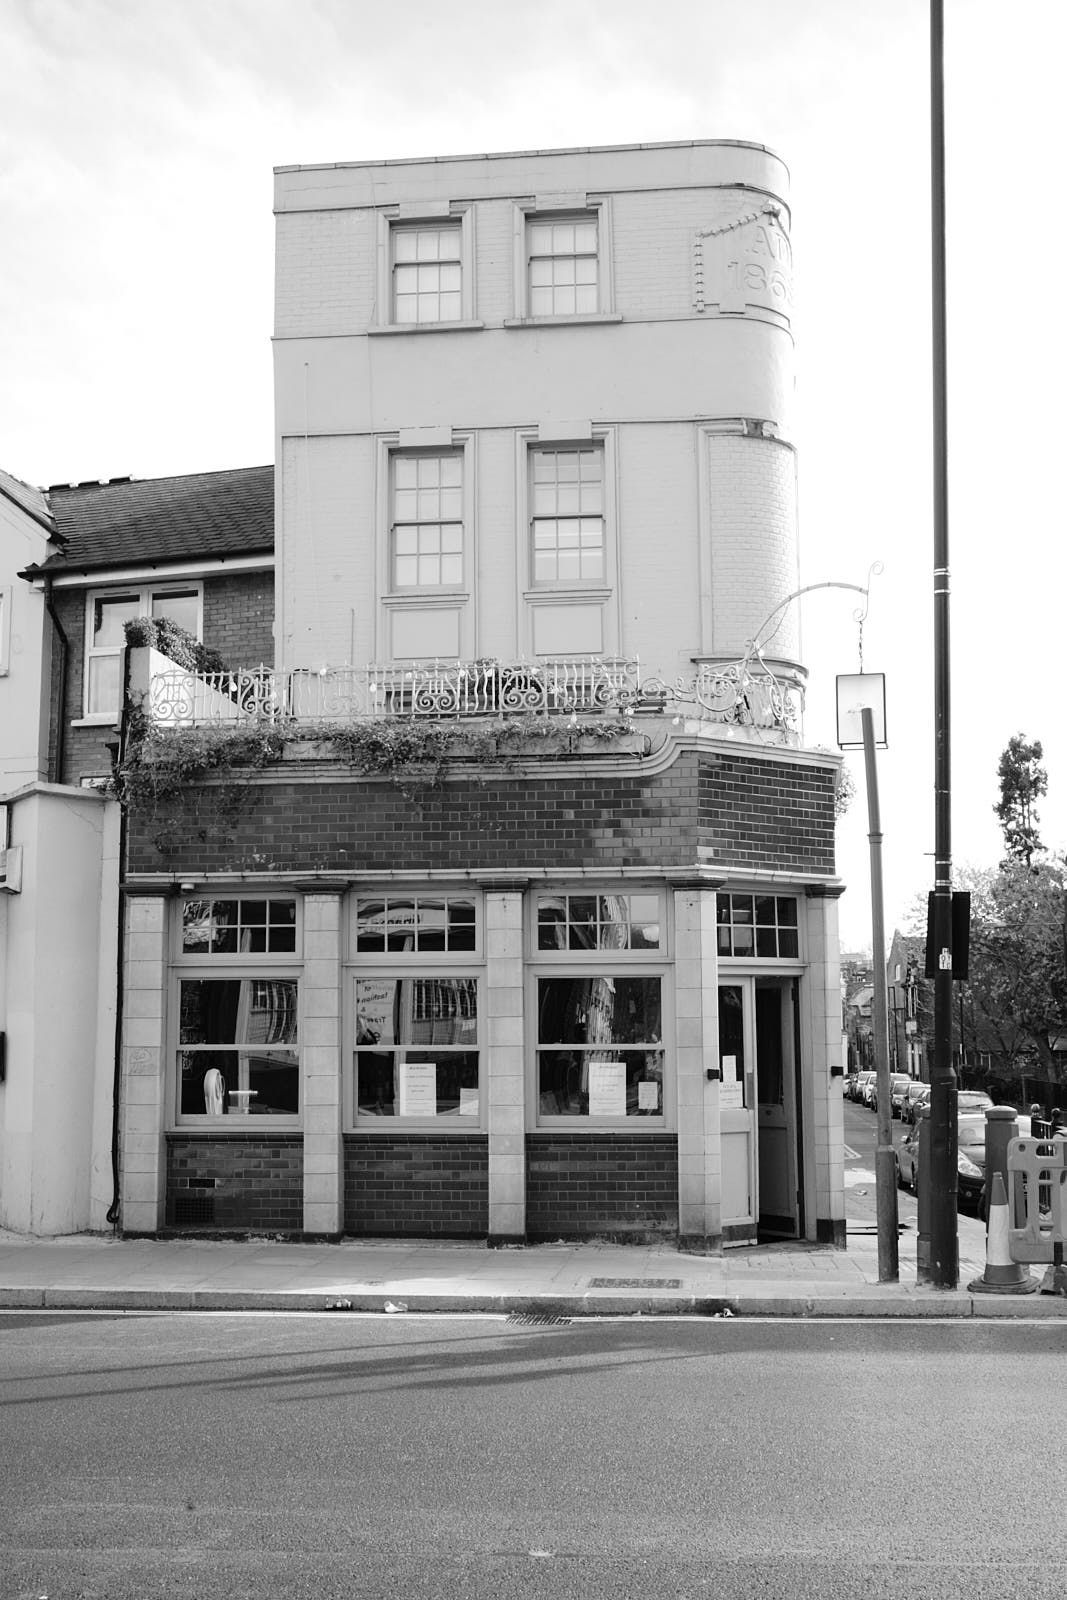 The exterior of the Marksman pub on Hackney Road, closed during coronavirus lockdown